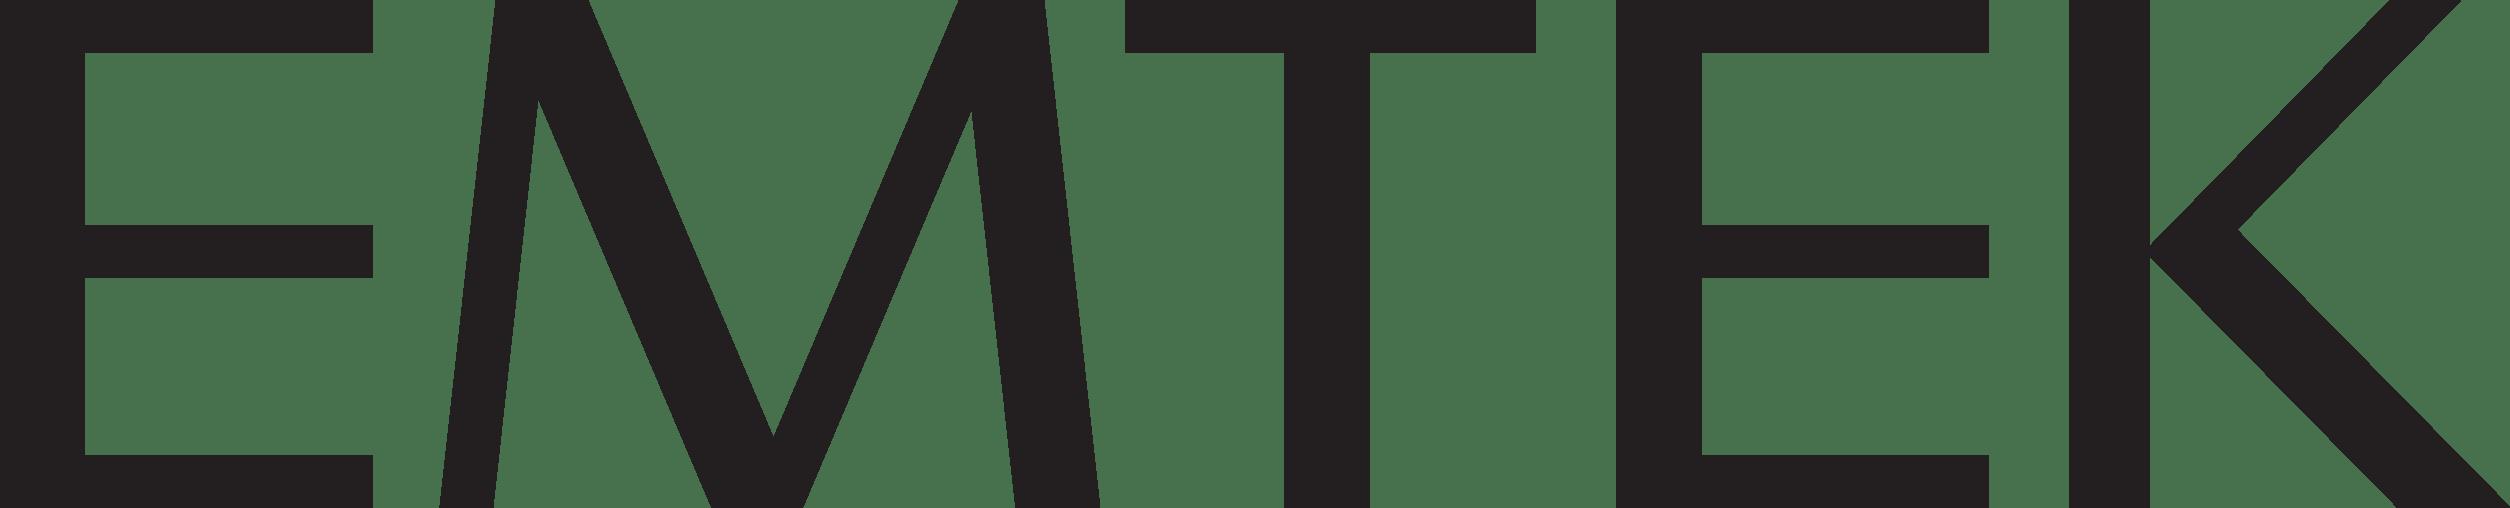 Emtek | The 2021 Lookbook